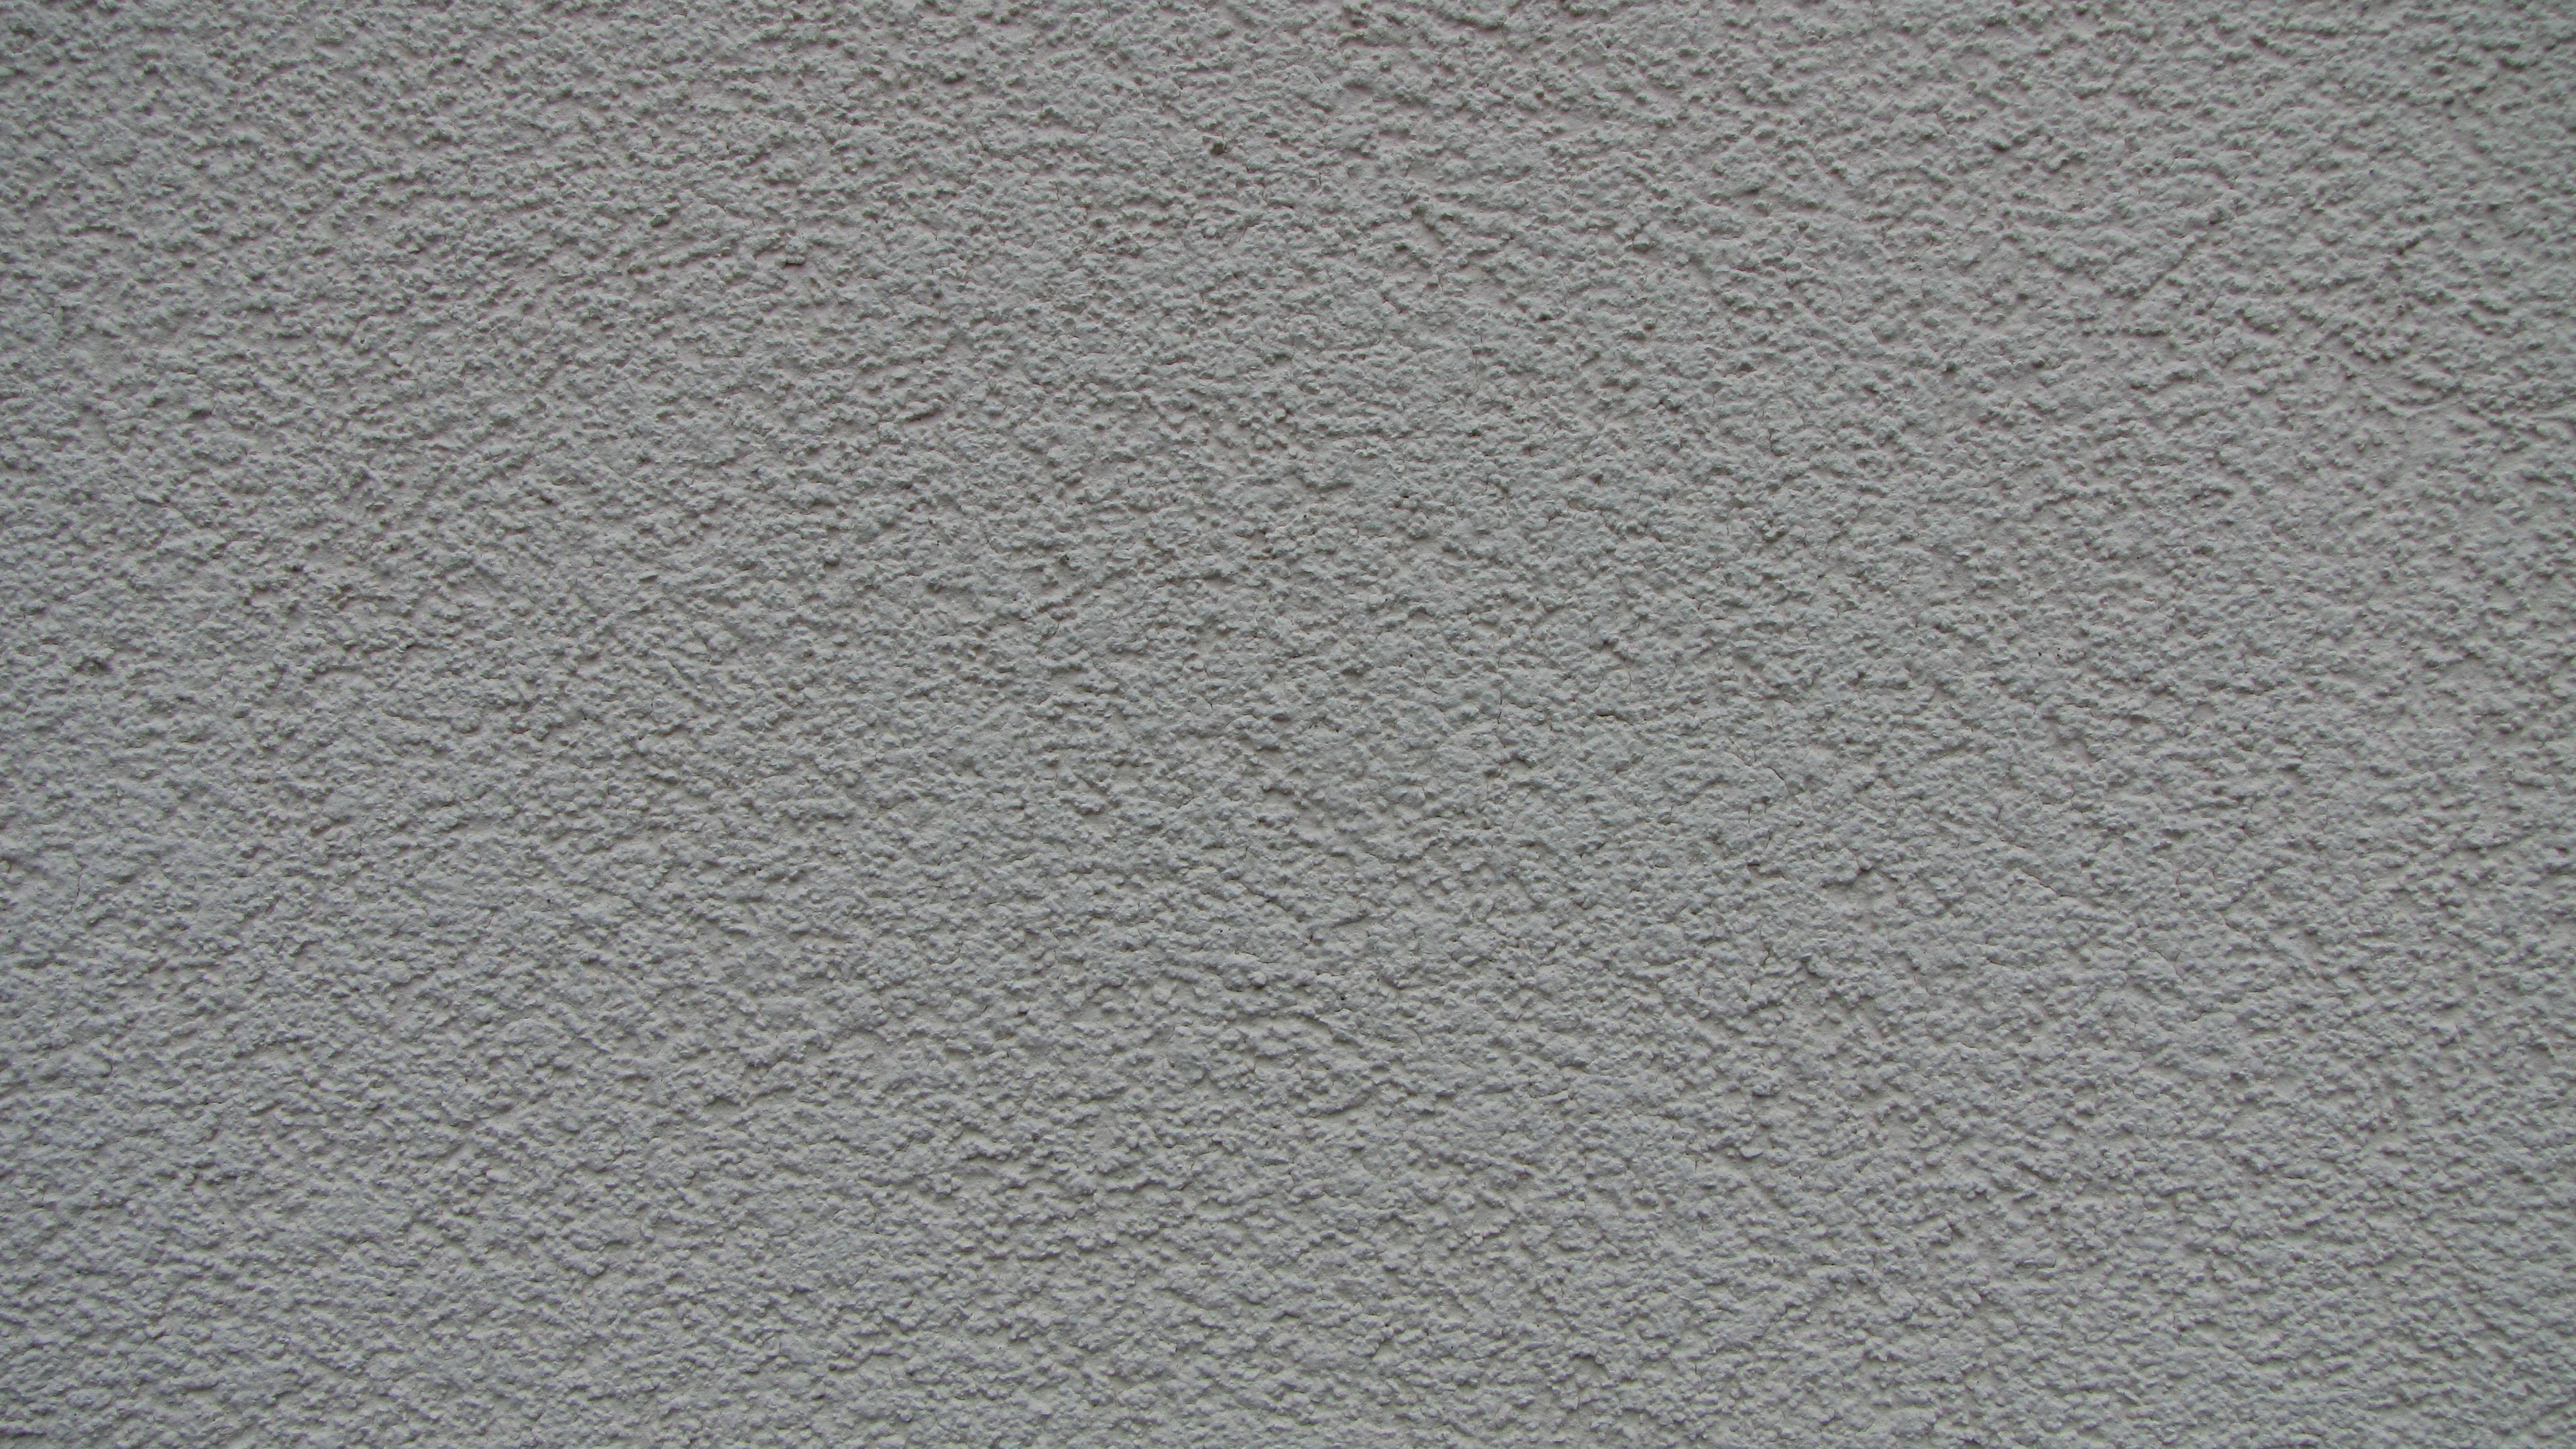 Structure Texture Floor Wall Asphalt Pattern Paint Material Grey Background Carpet Plaster Flooring Wood Road